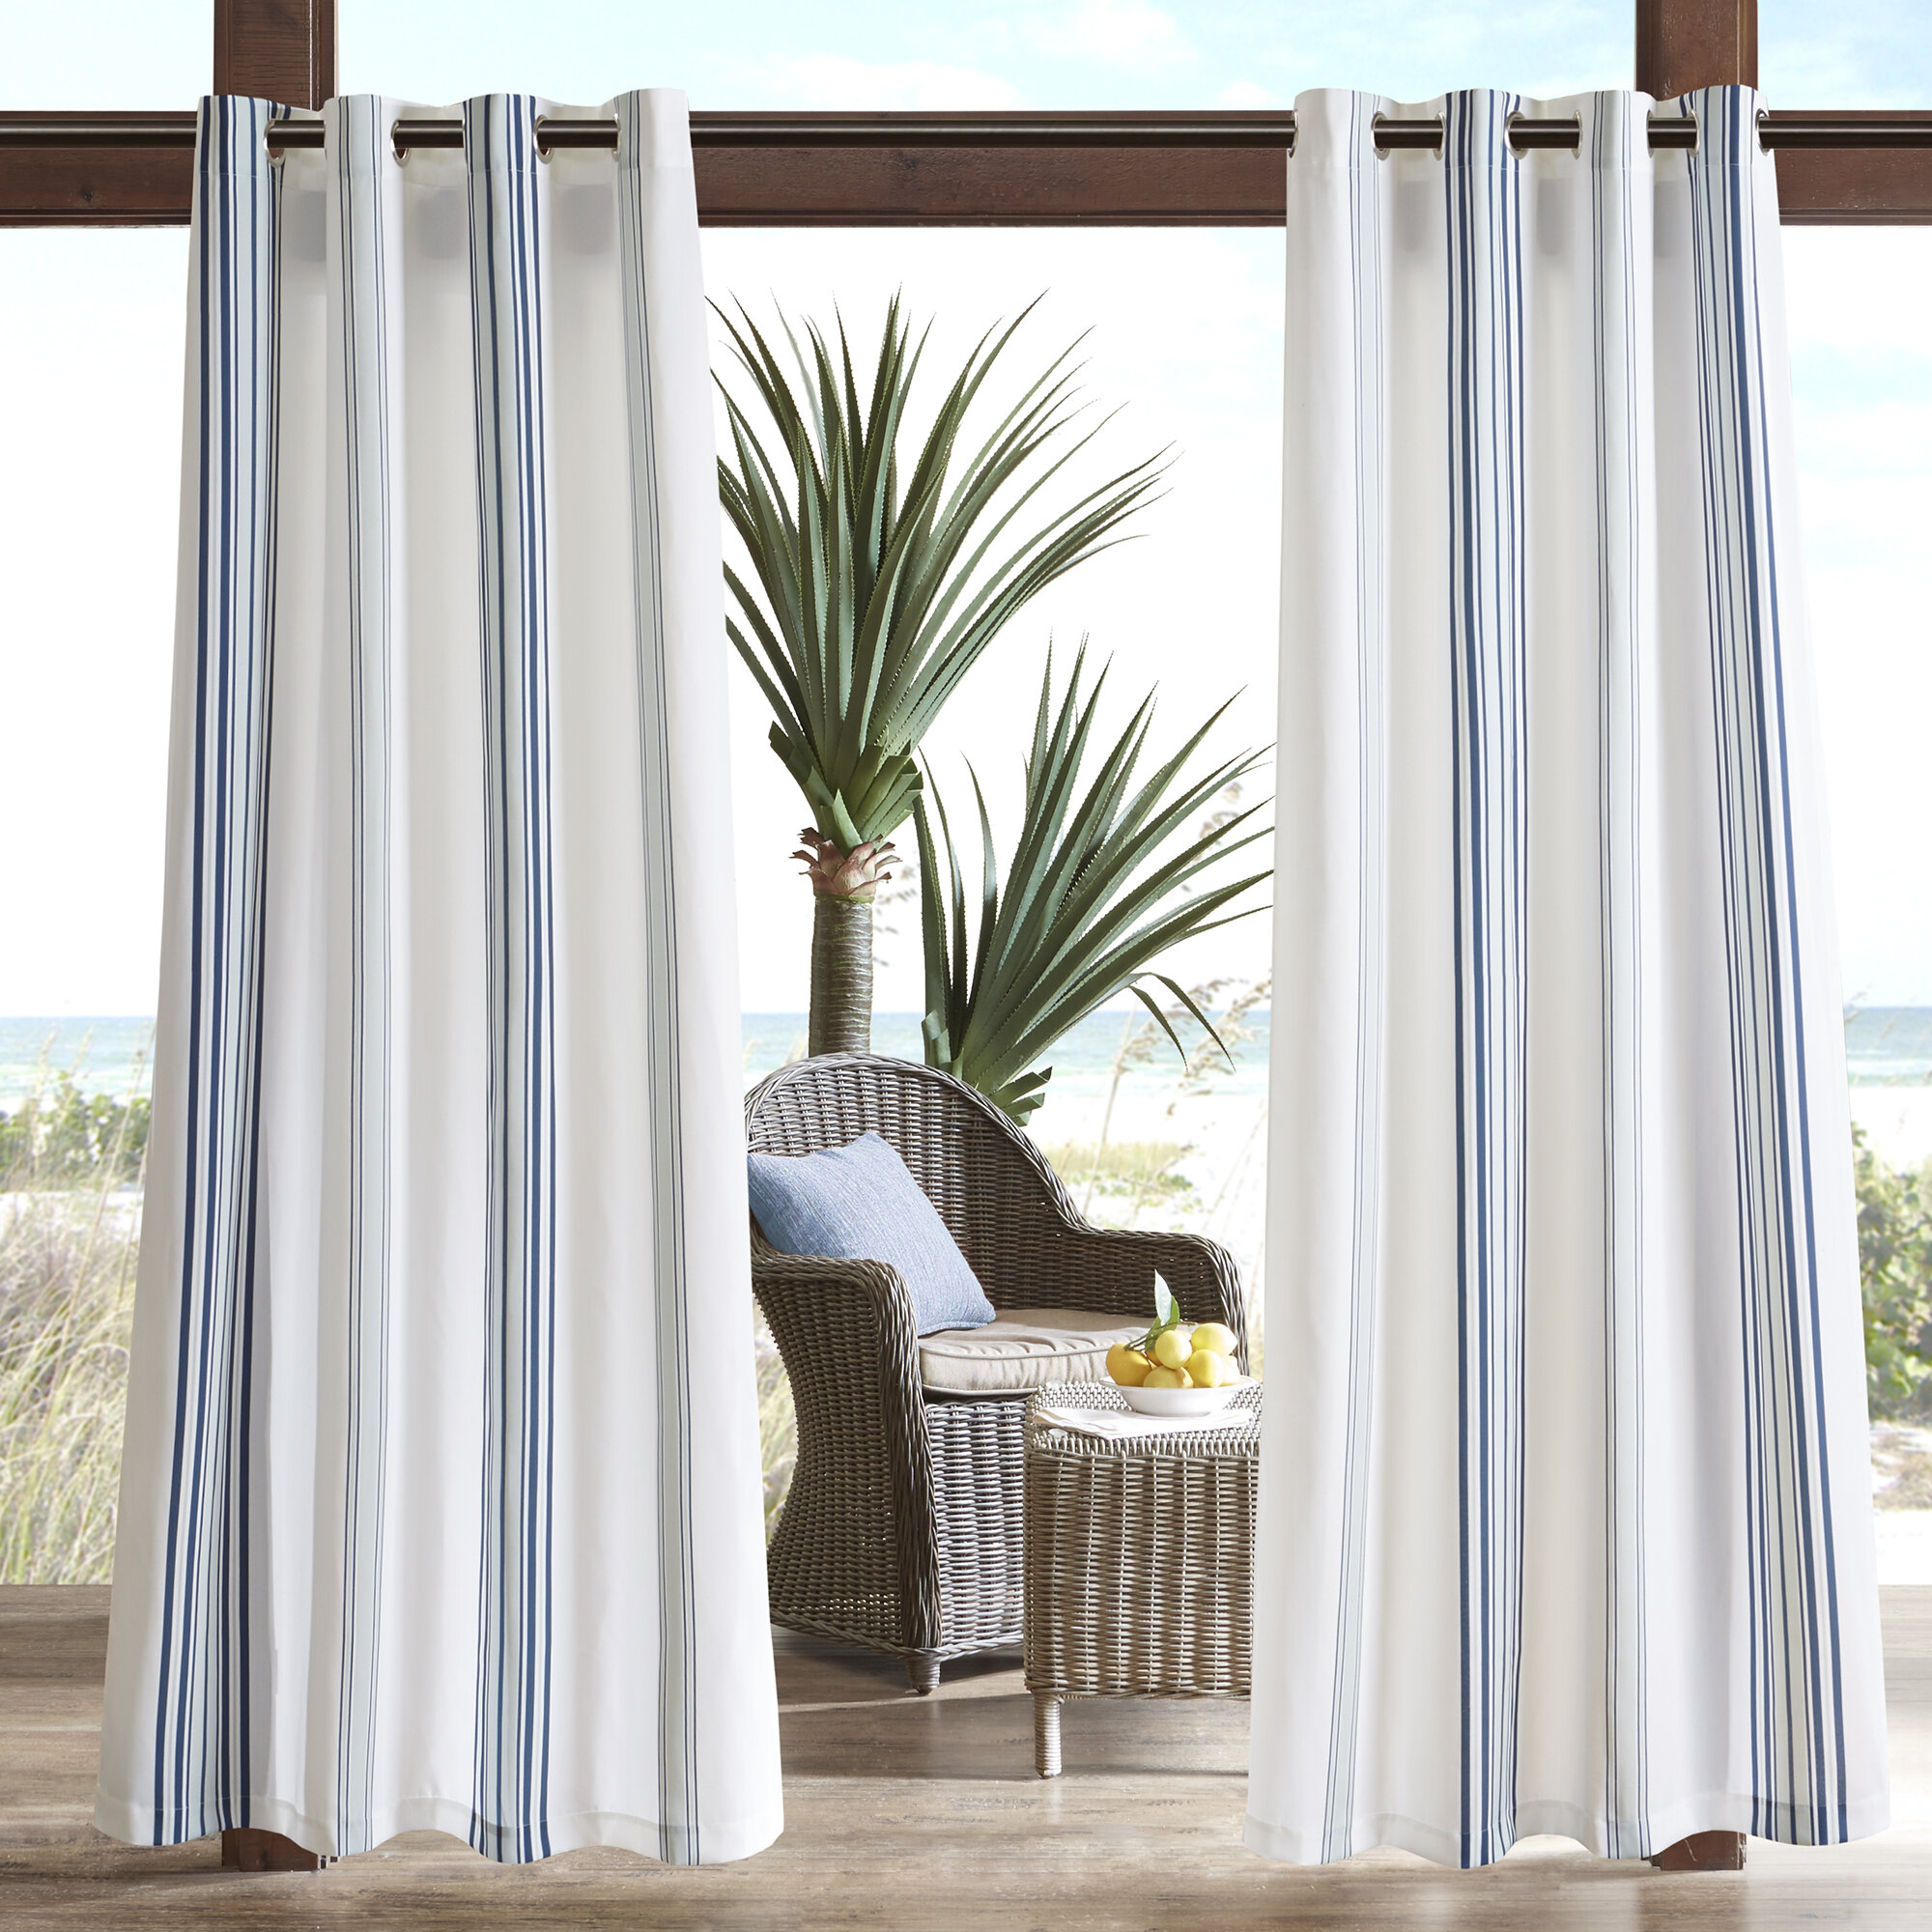 Corbin Striped Light Filtering Outdoor Single Curtain Panel Regarding Valencia Cabana Stripe Indoor/outdoor Curtain Panels (View 22 of 30)